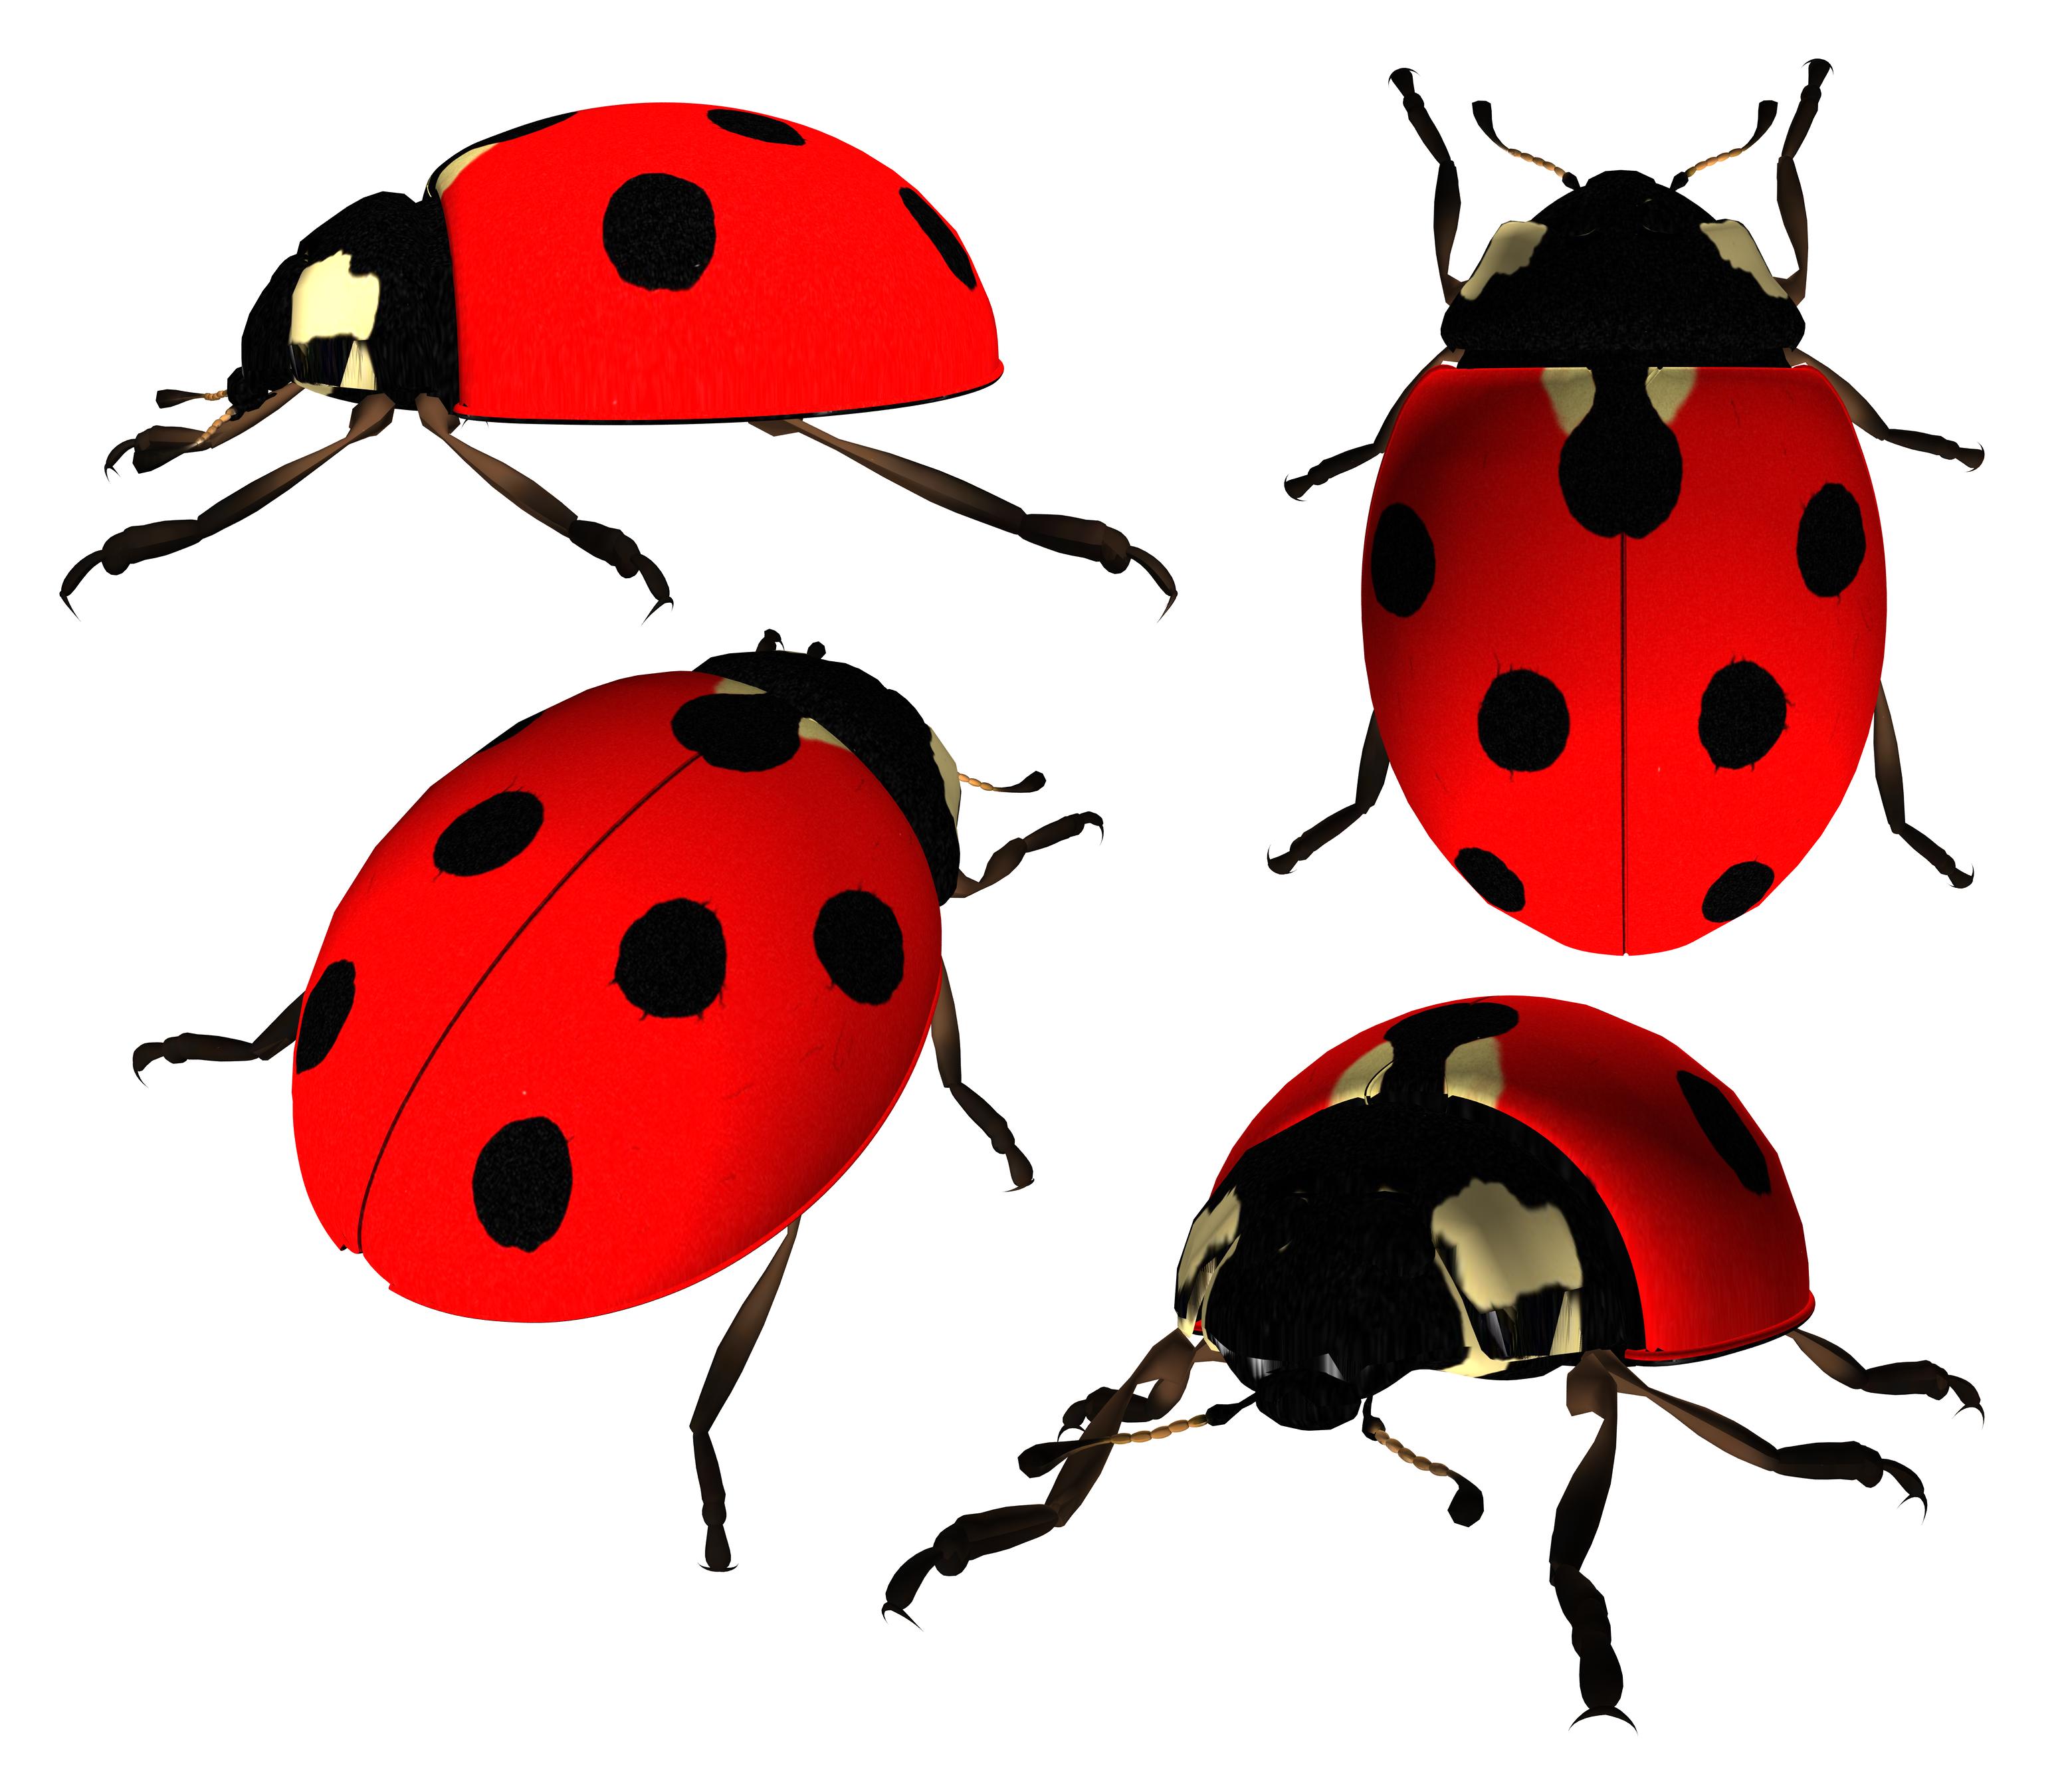 ladybug PNG image - Ladybug HD PNG